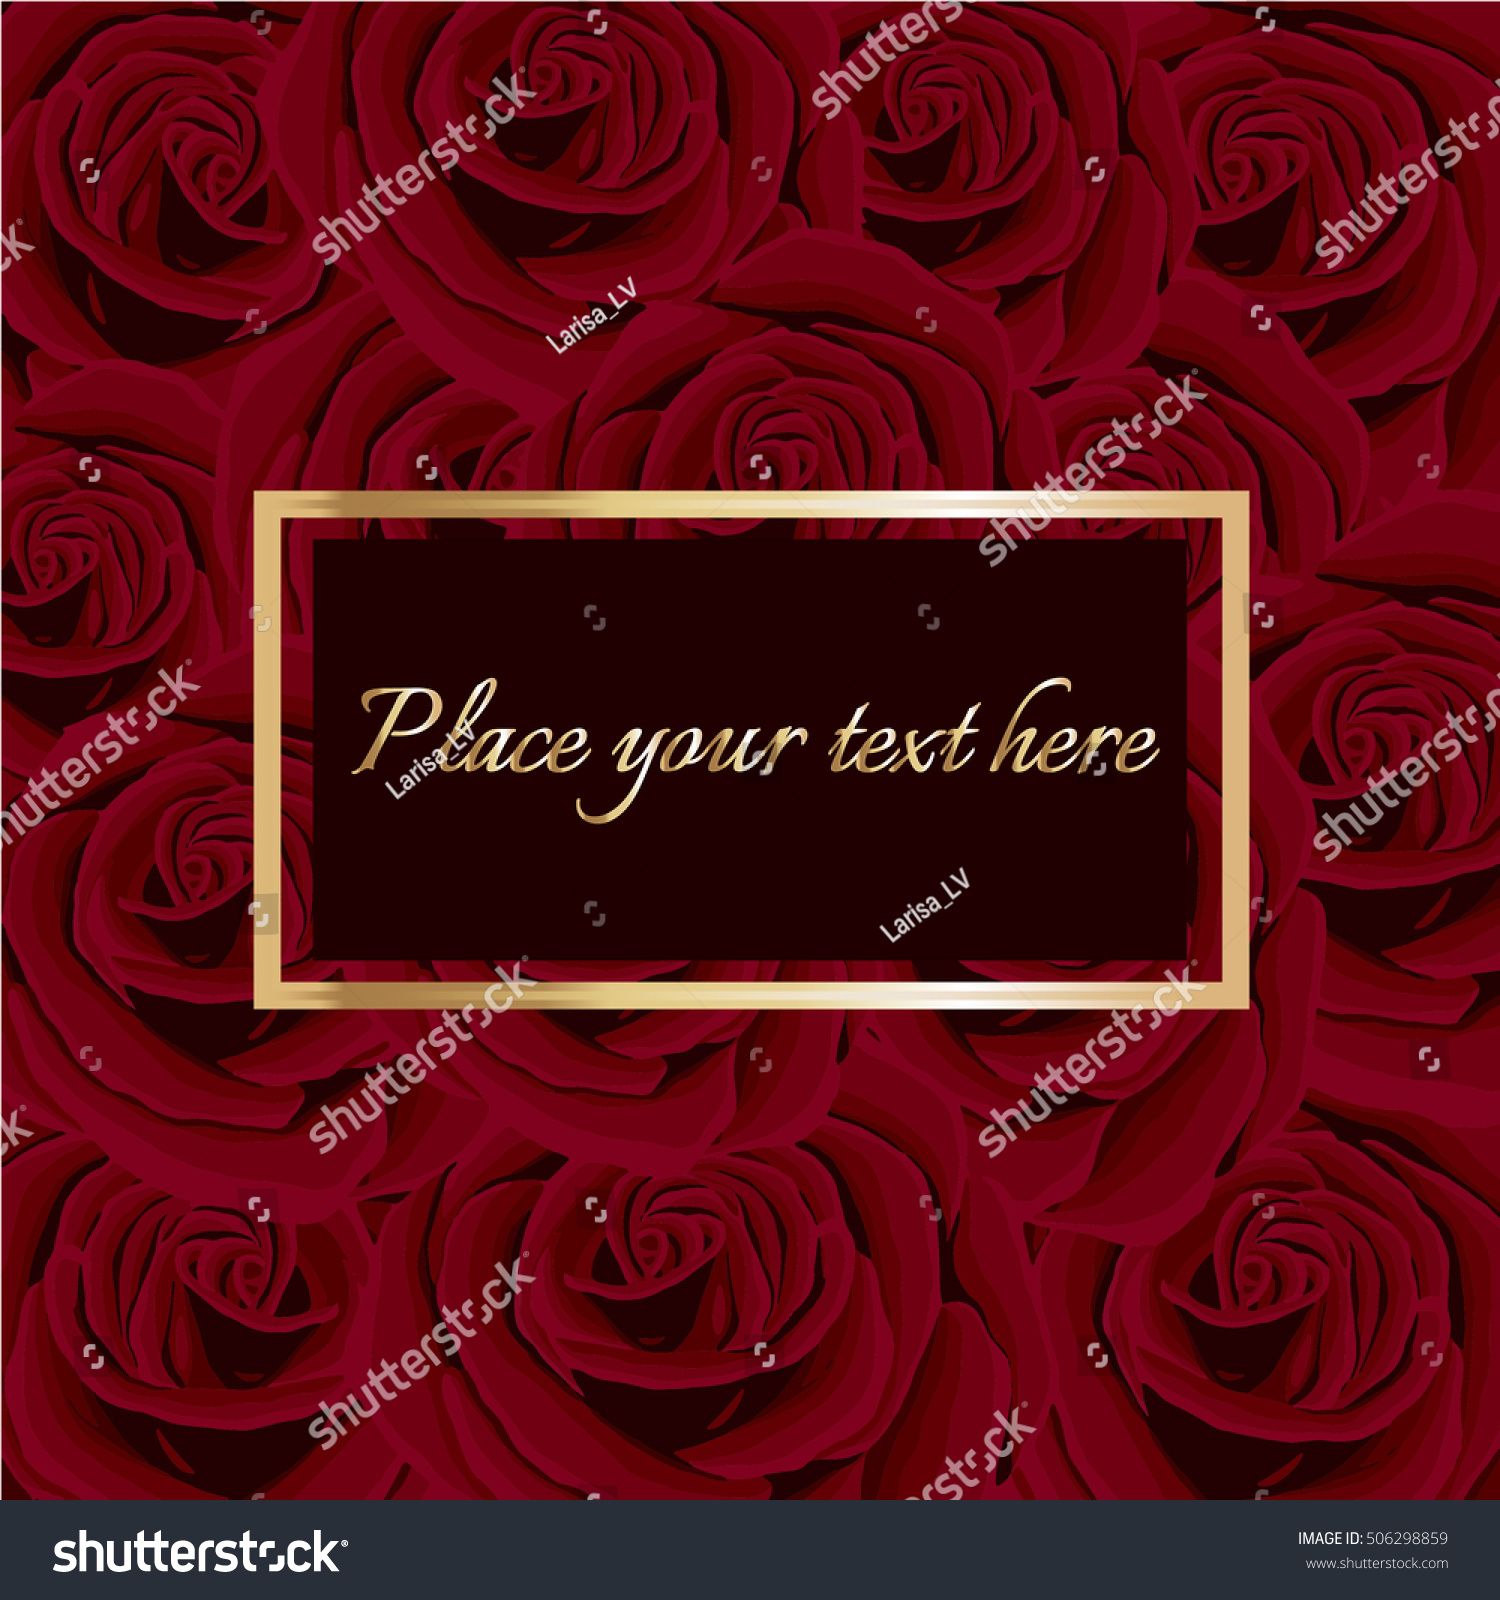 Romantic Wedding Invitation Red Roses Background Golden Stock Vector ...